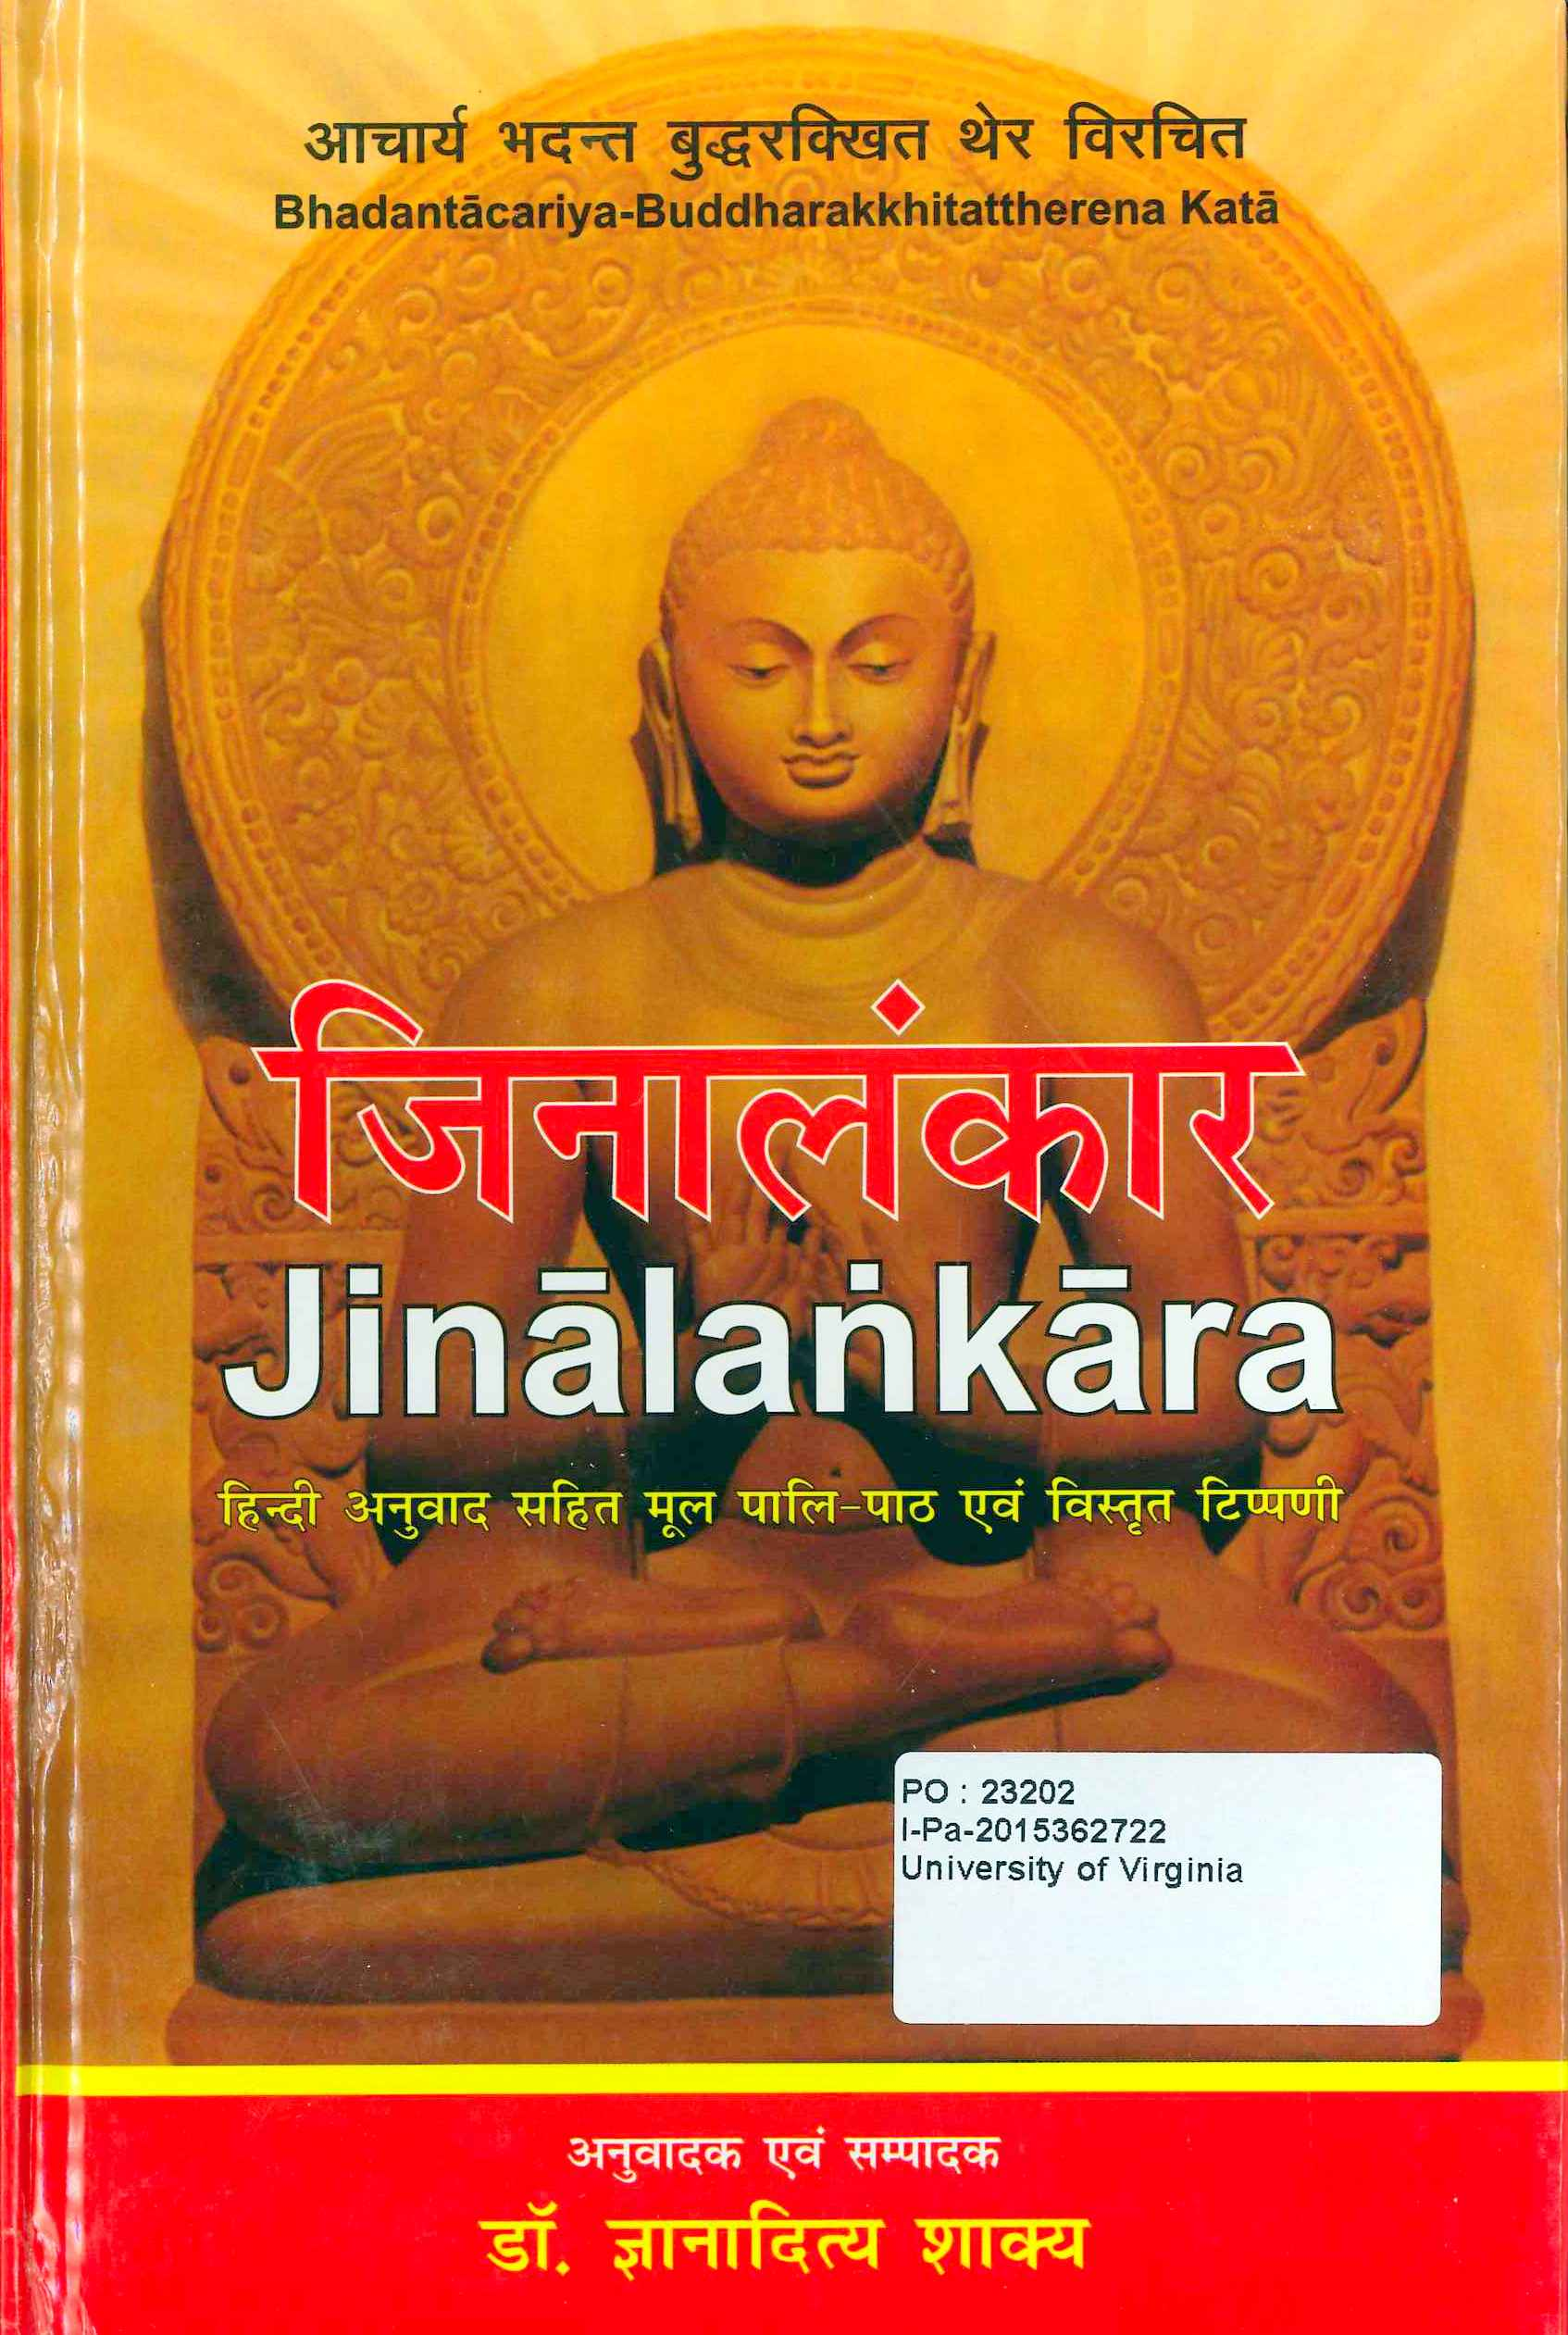 Poem on Gautama Buddha